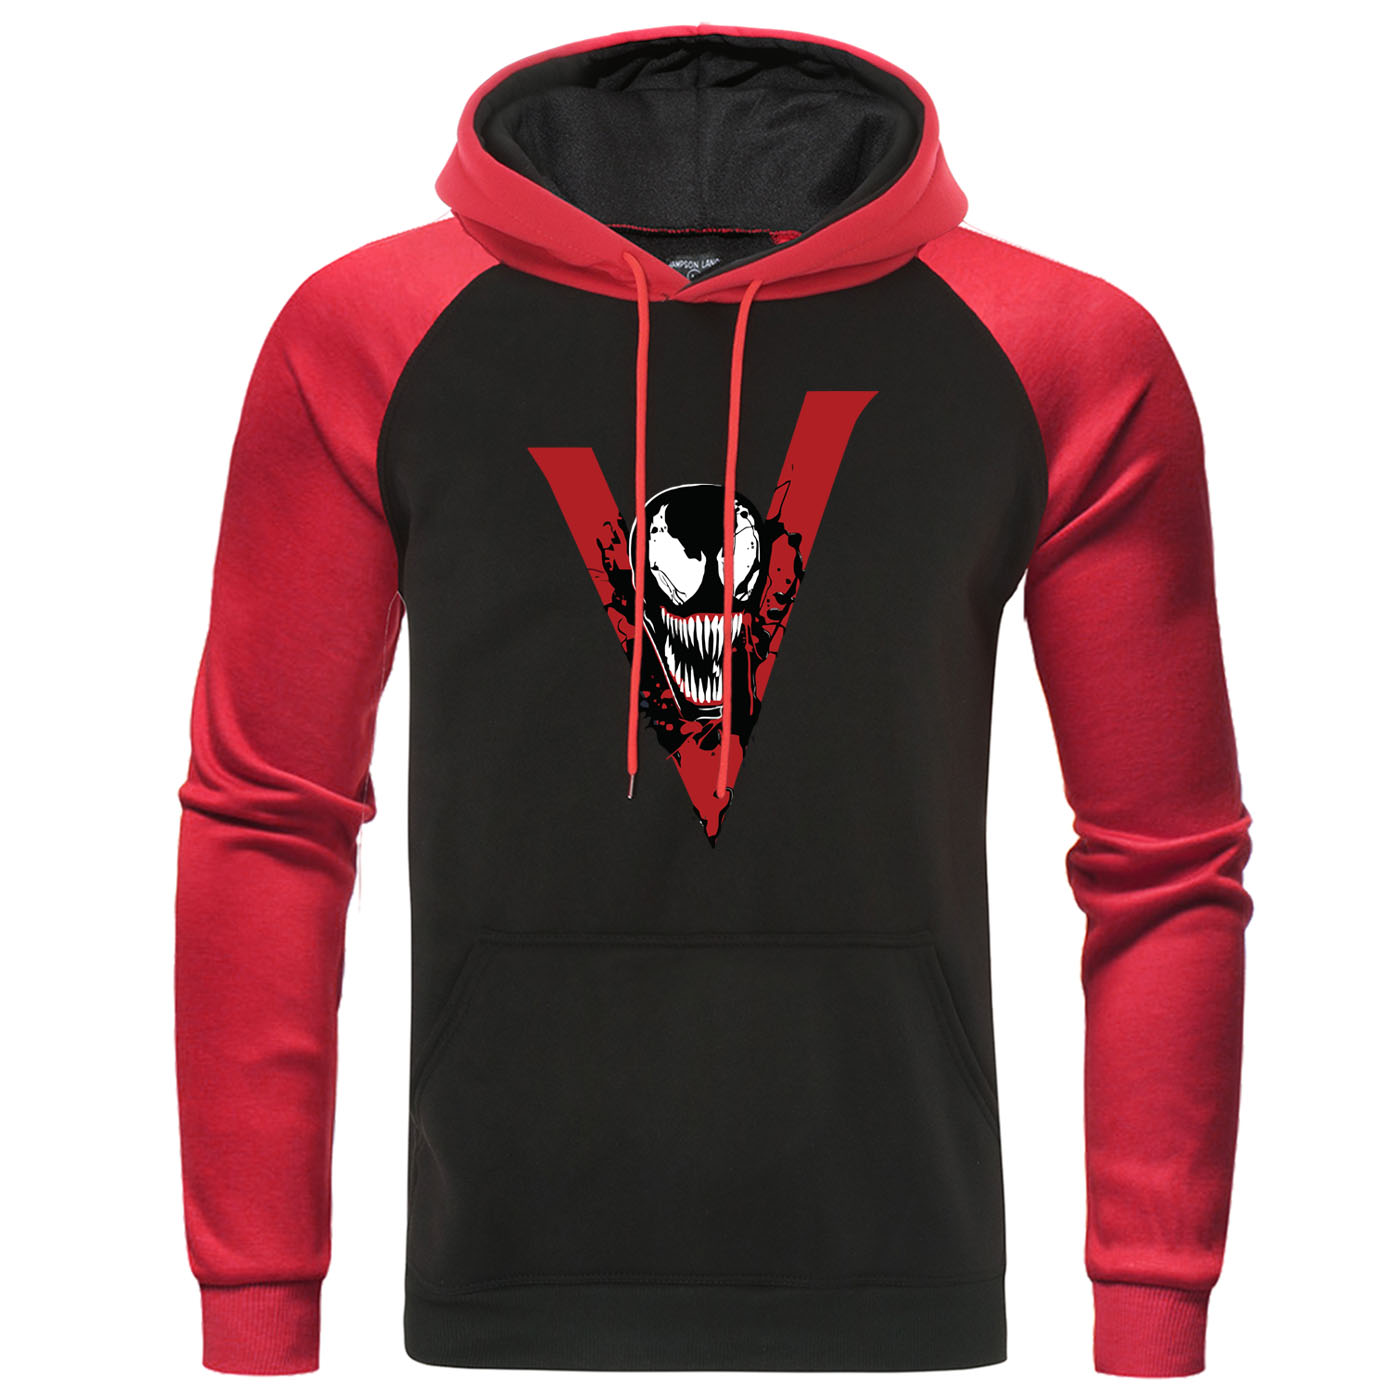 Venom Hoodies Men Fashion Sweatshirts Superhero Raglan Pullover Mens Autumn Winter Hoodie Streetwear Marvel Casual Tracksuit